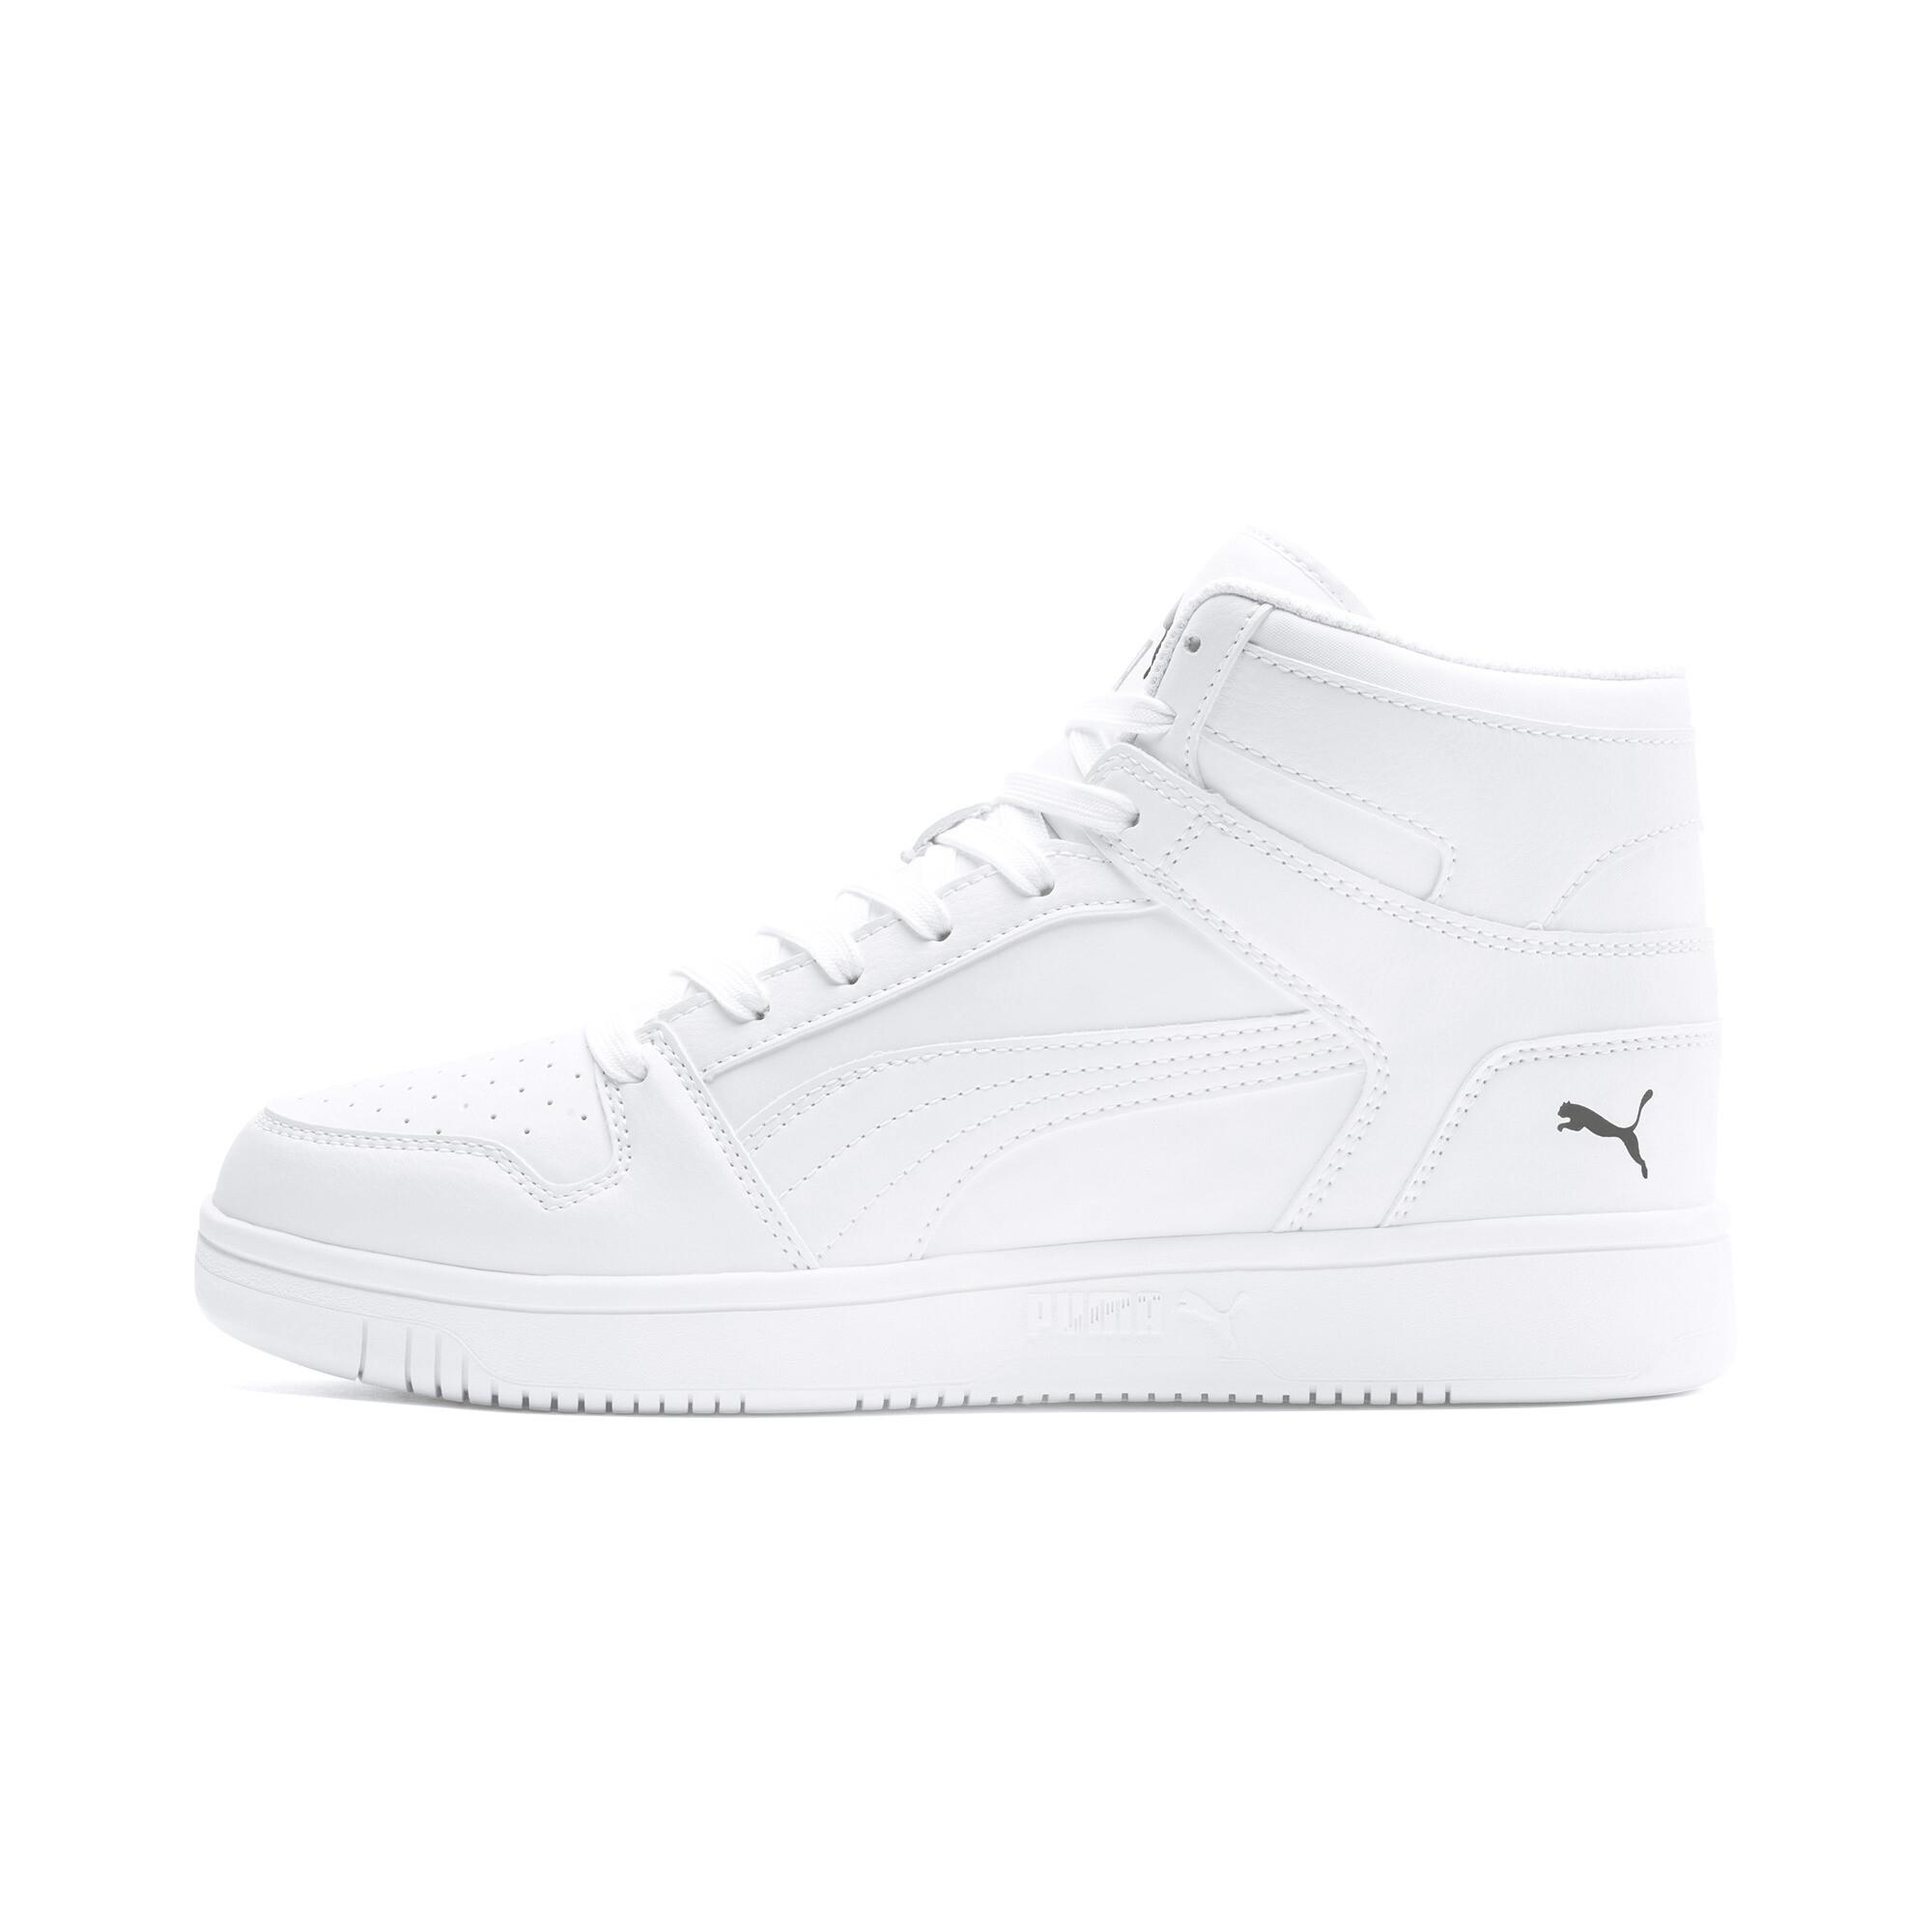 PUMA-PUMA-Rebound-LayUp-Men-039-s-Sneakers-Men-Mid-Boot-Basics thumbnail 17